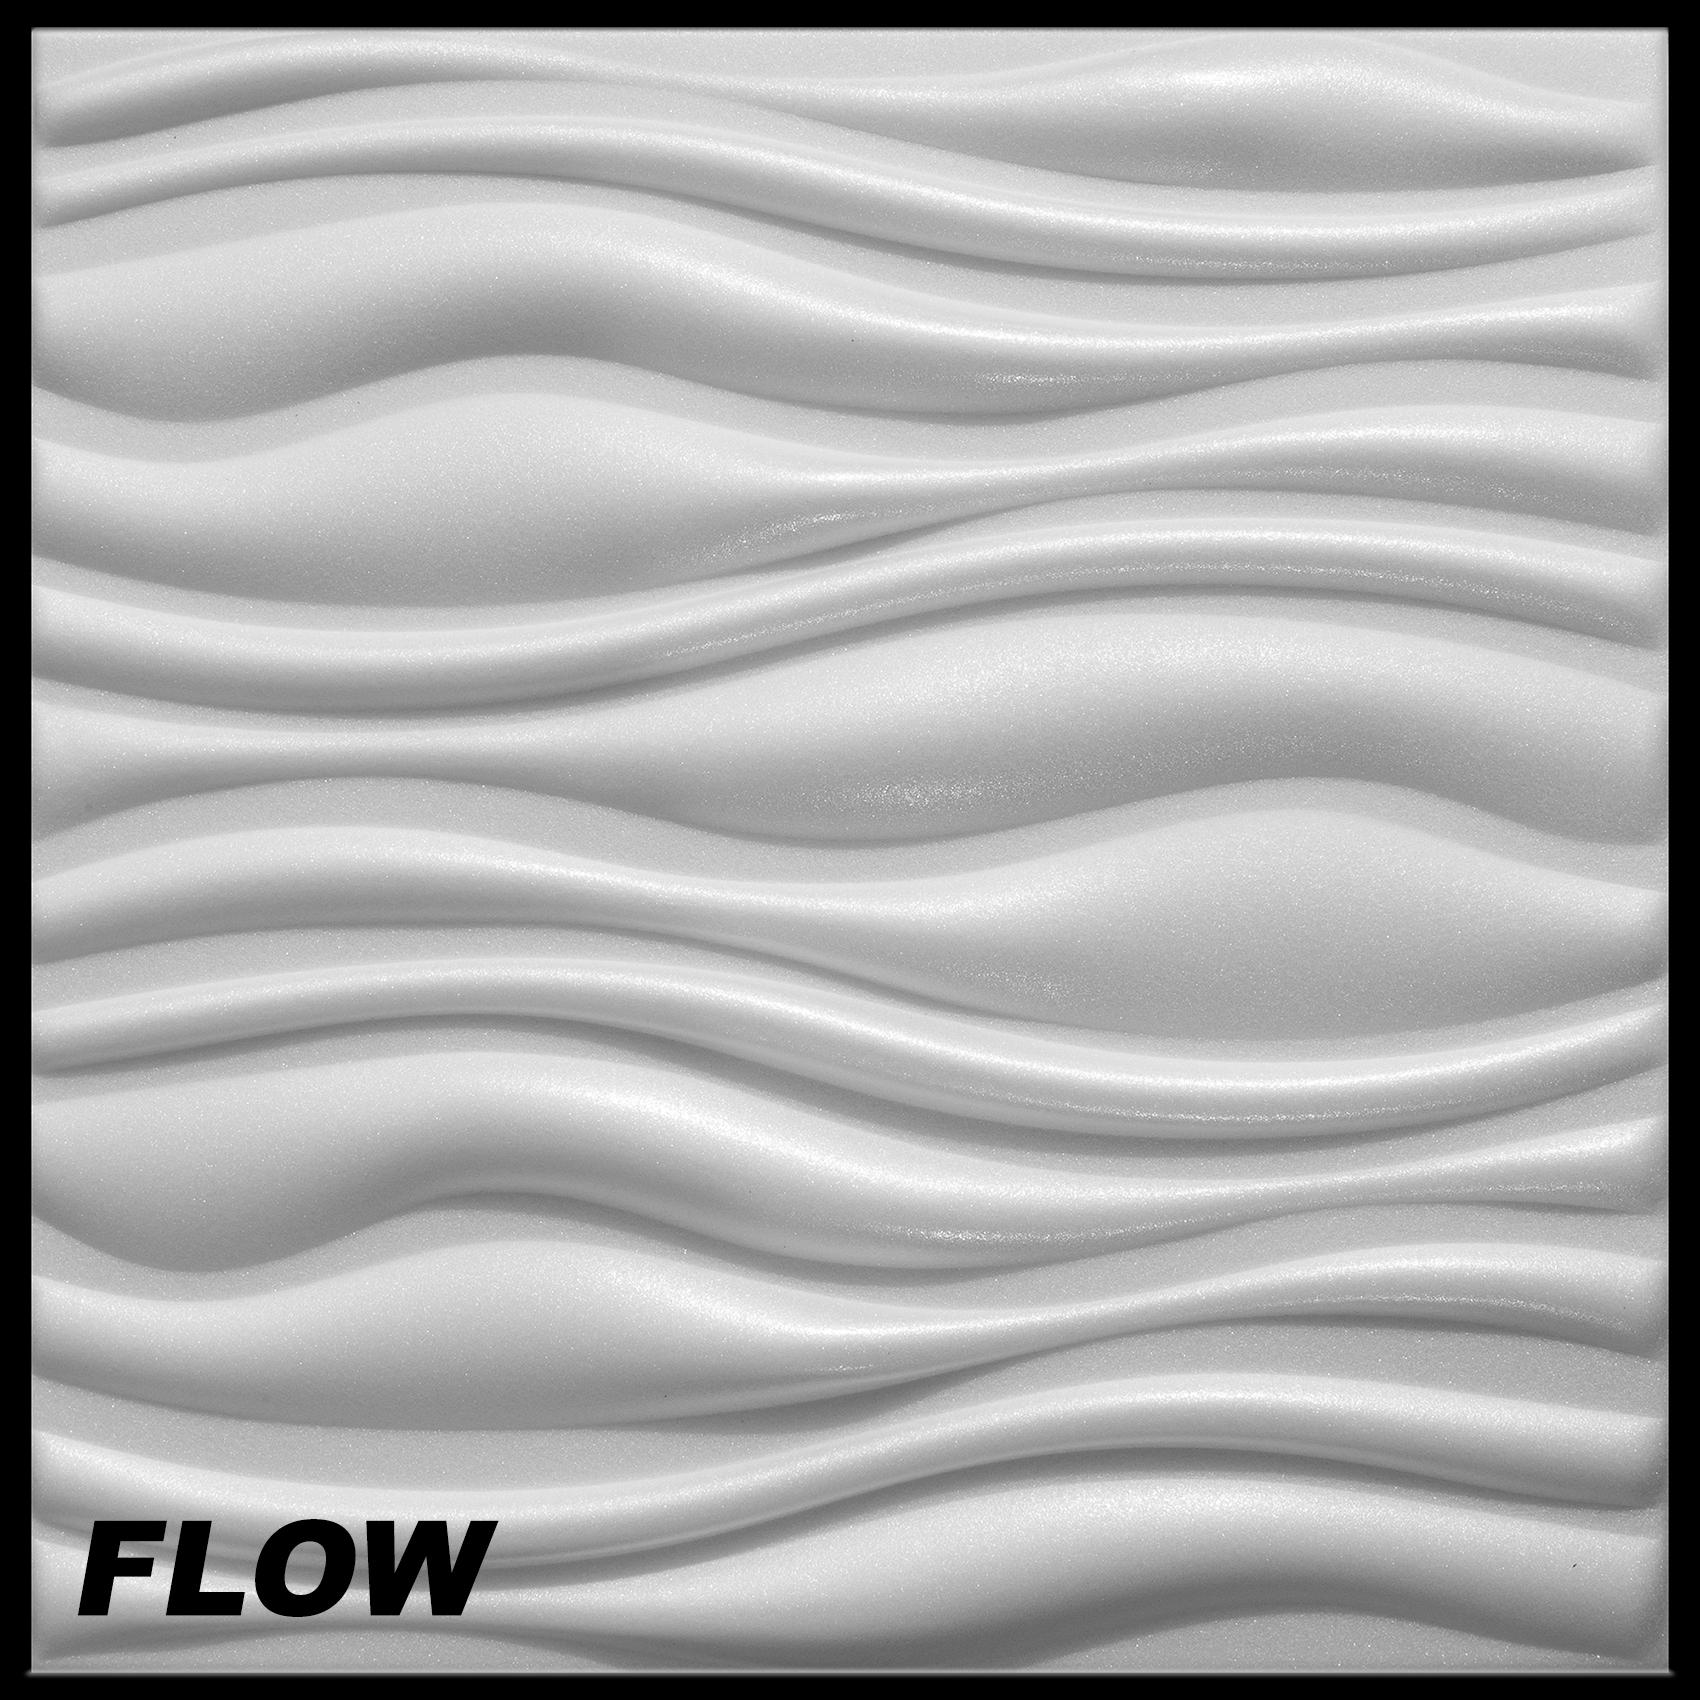 1 m2 platten 3d polystyrol wand decke paneele wandplatten 50x50cm flow ebay. Black Bedroom Furniture Sets. Home Design Ideas